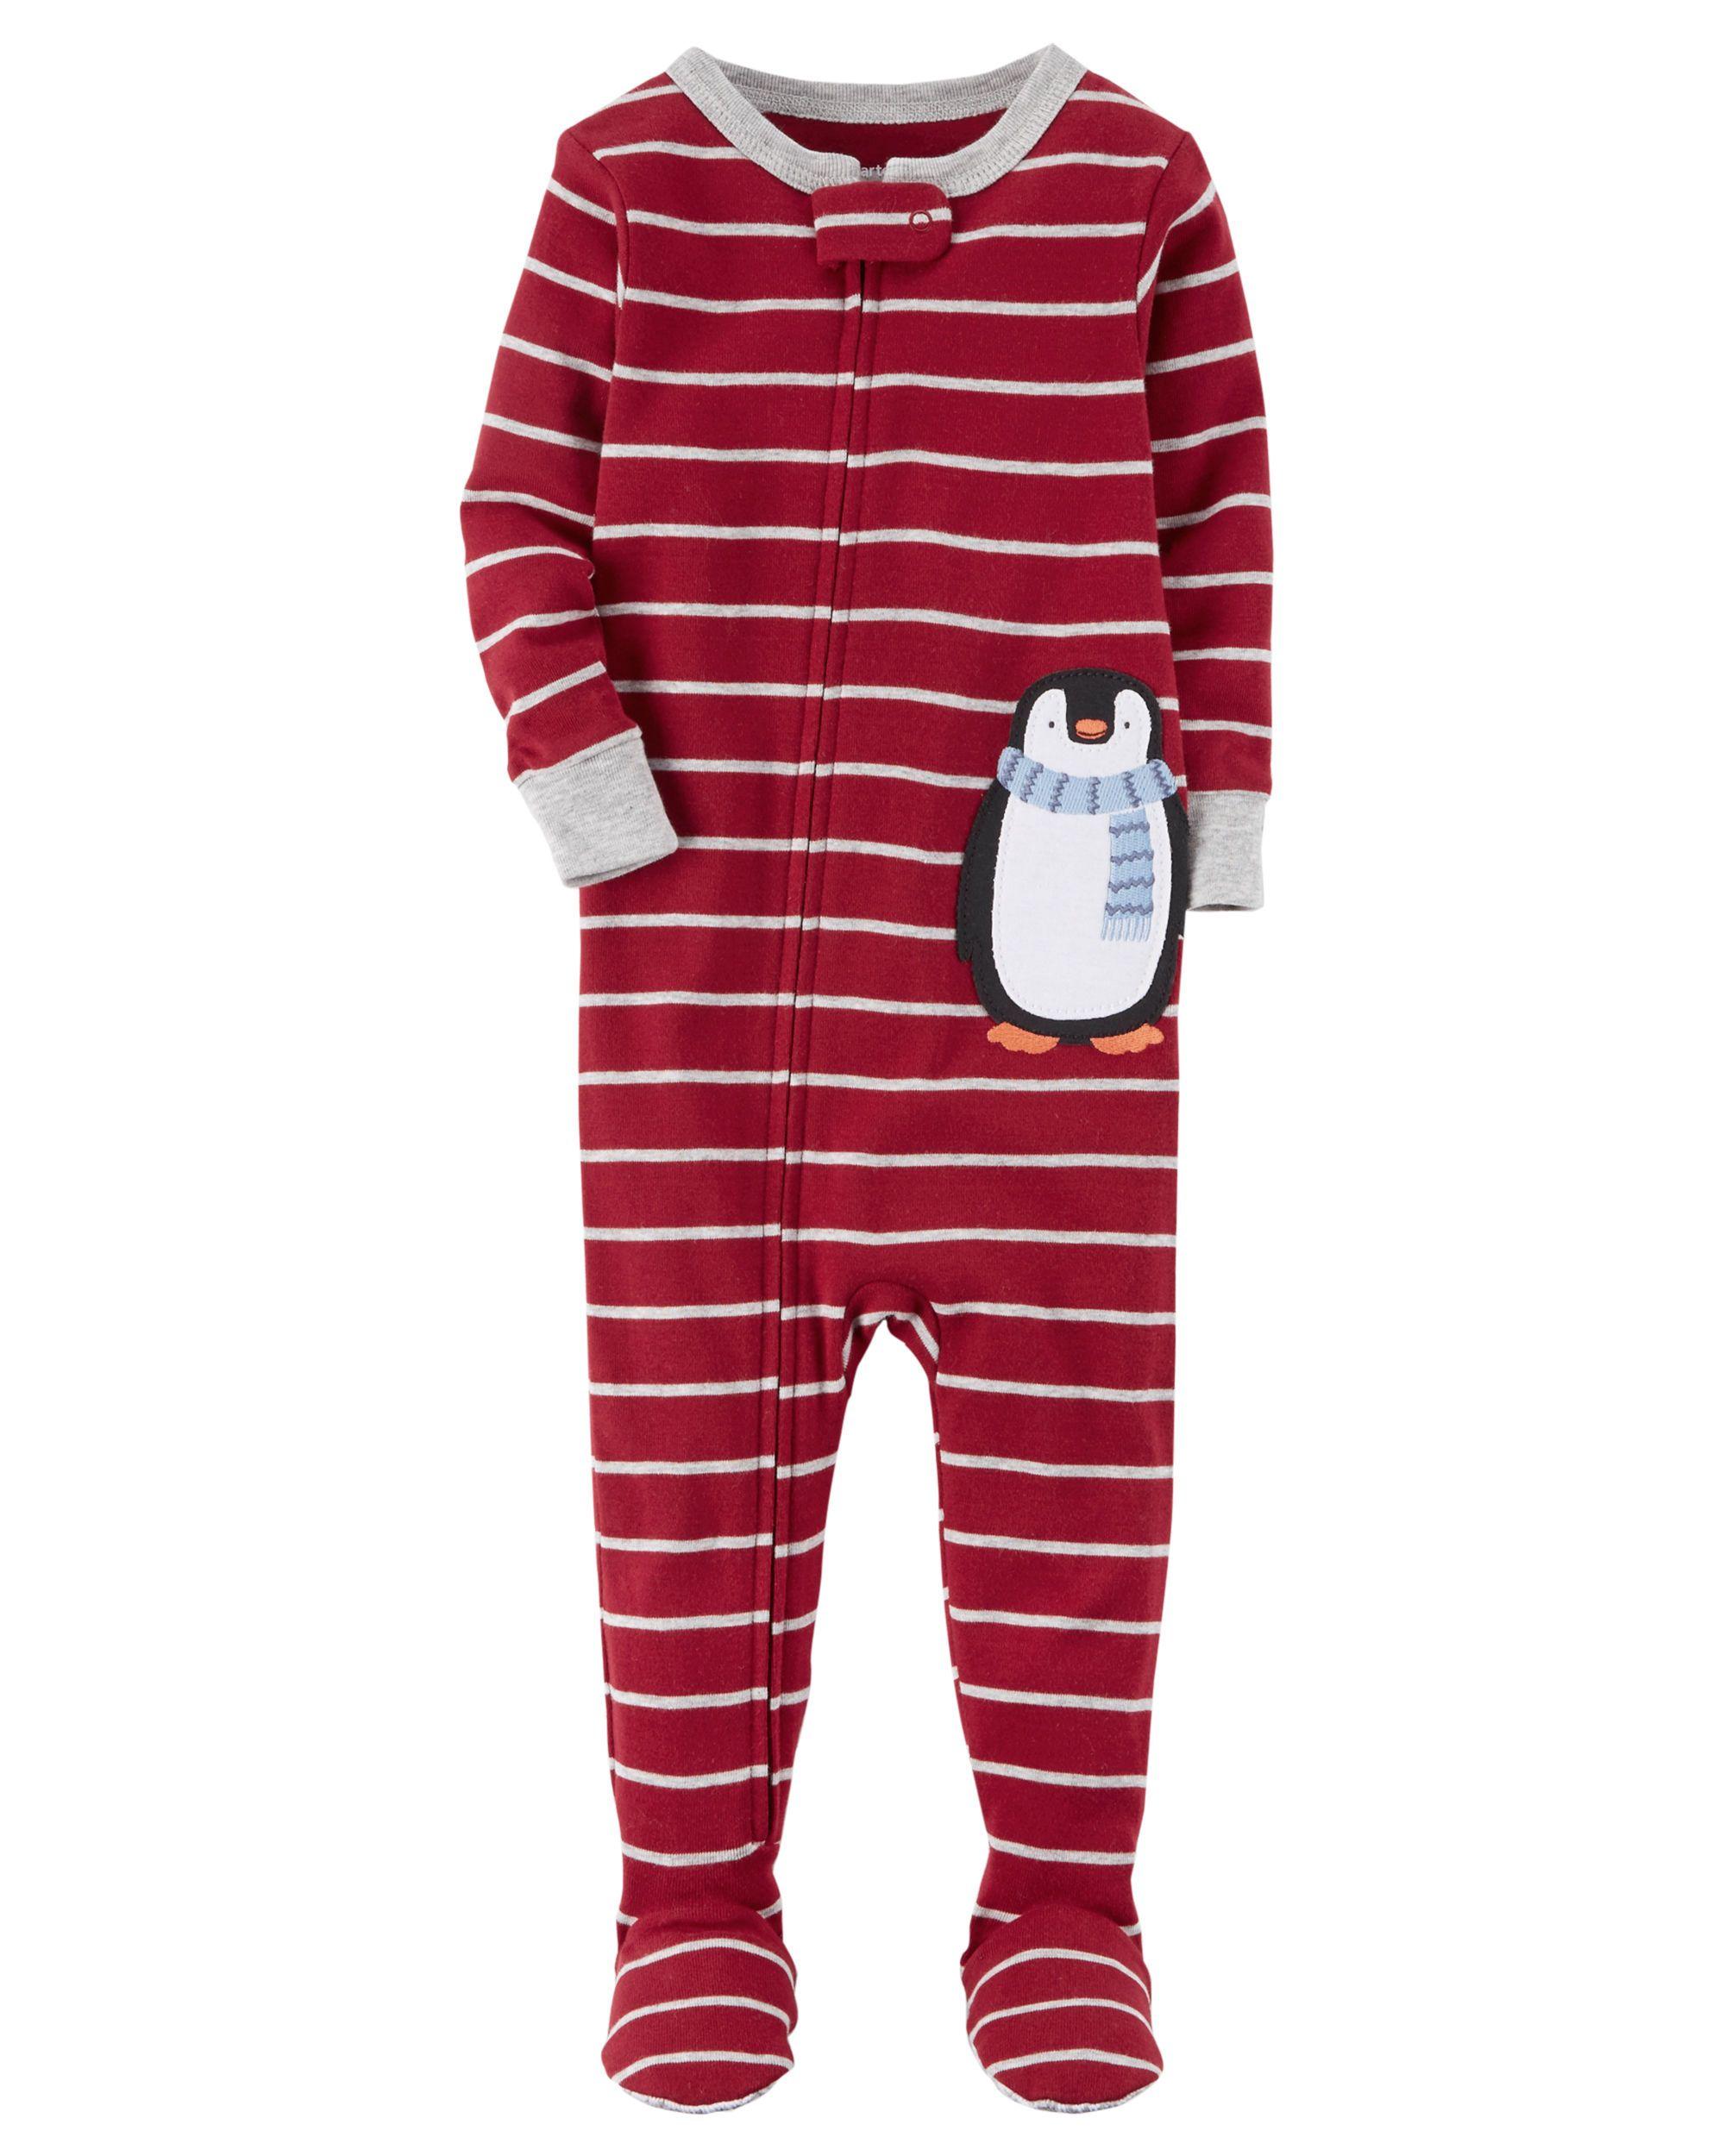 baad97850 Baby Boy 1-Piece Penguin Snug Fit Cotton PJs